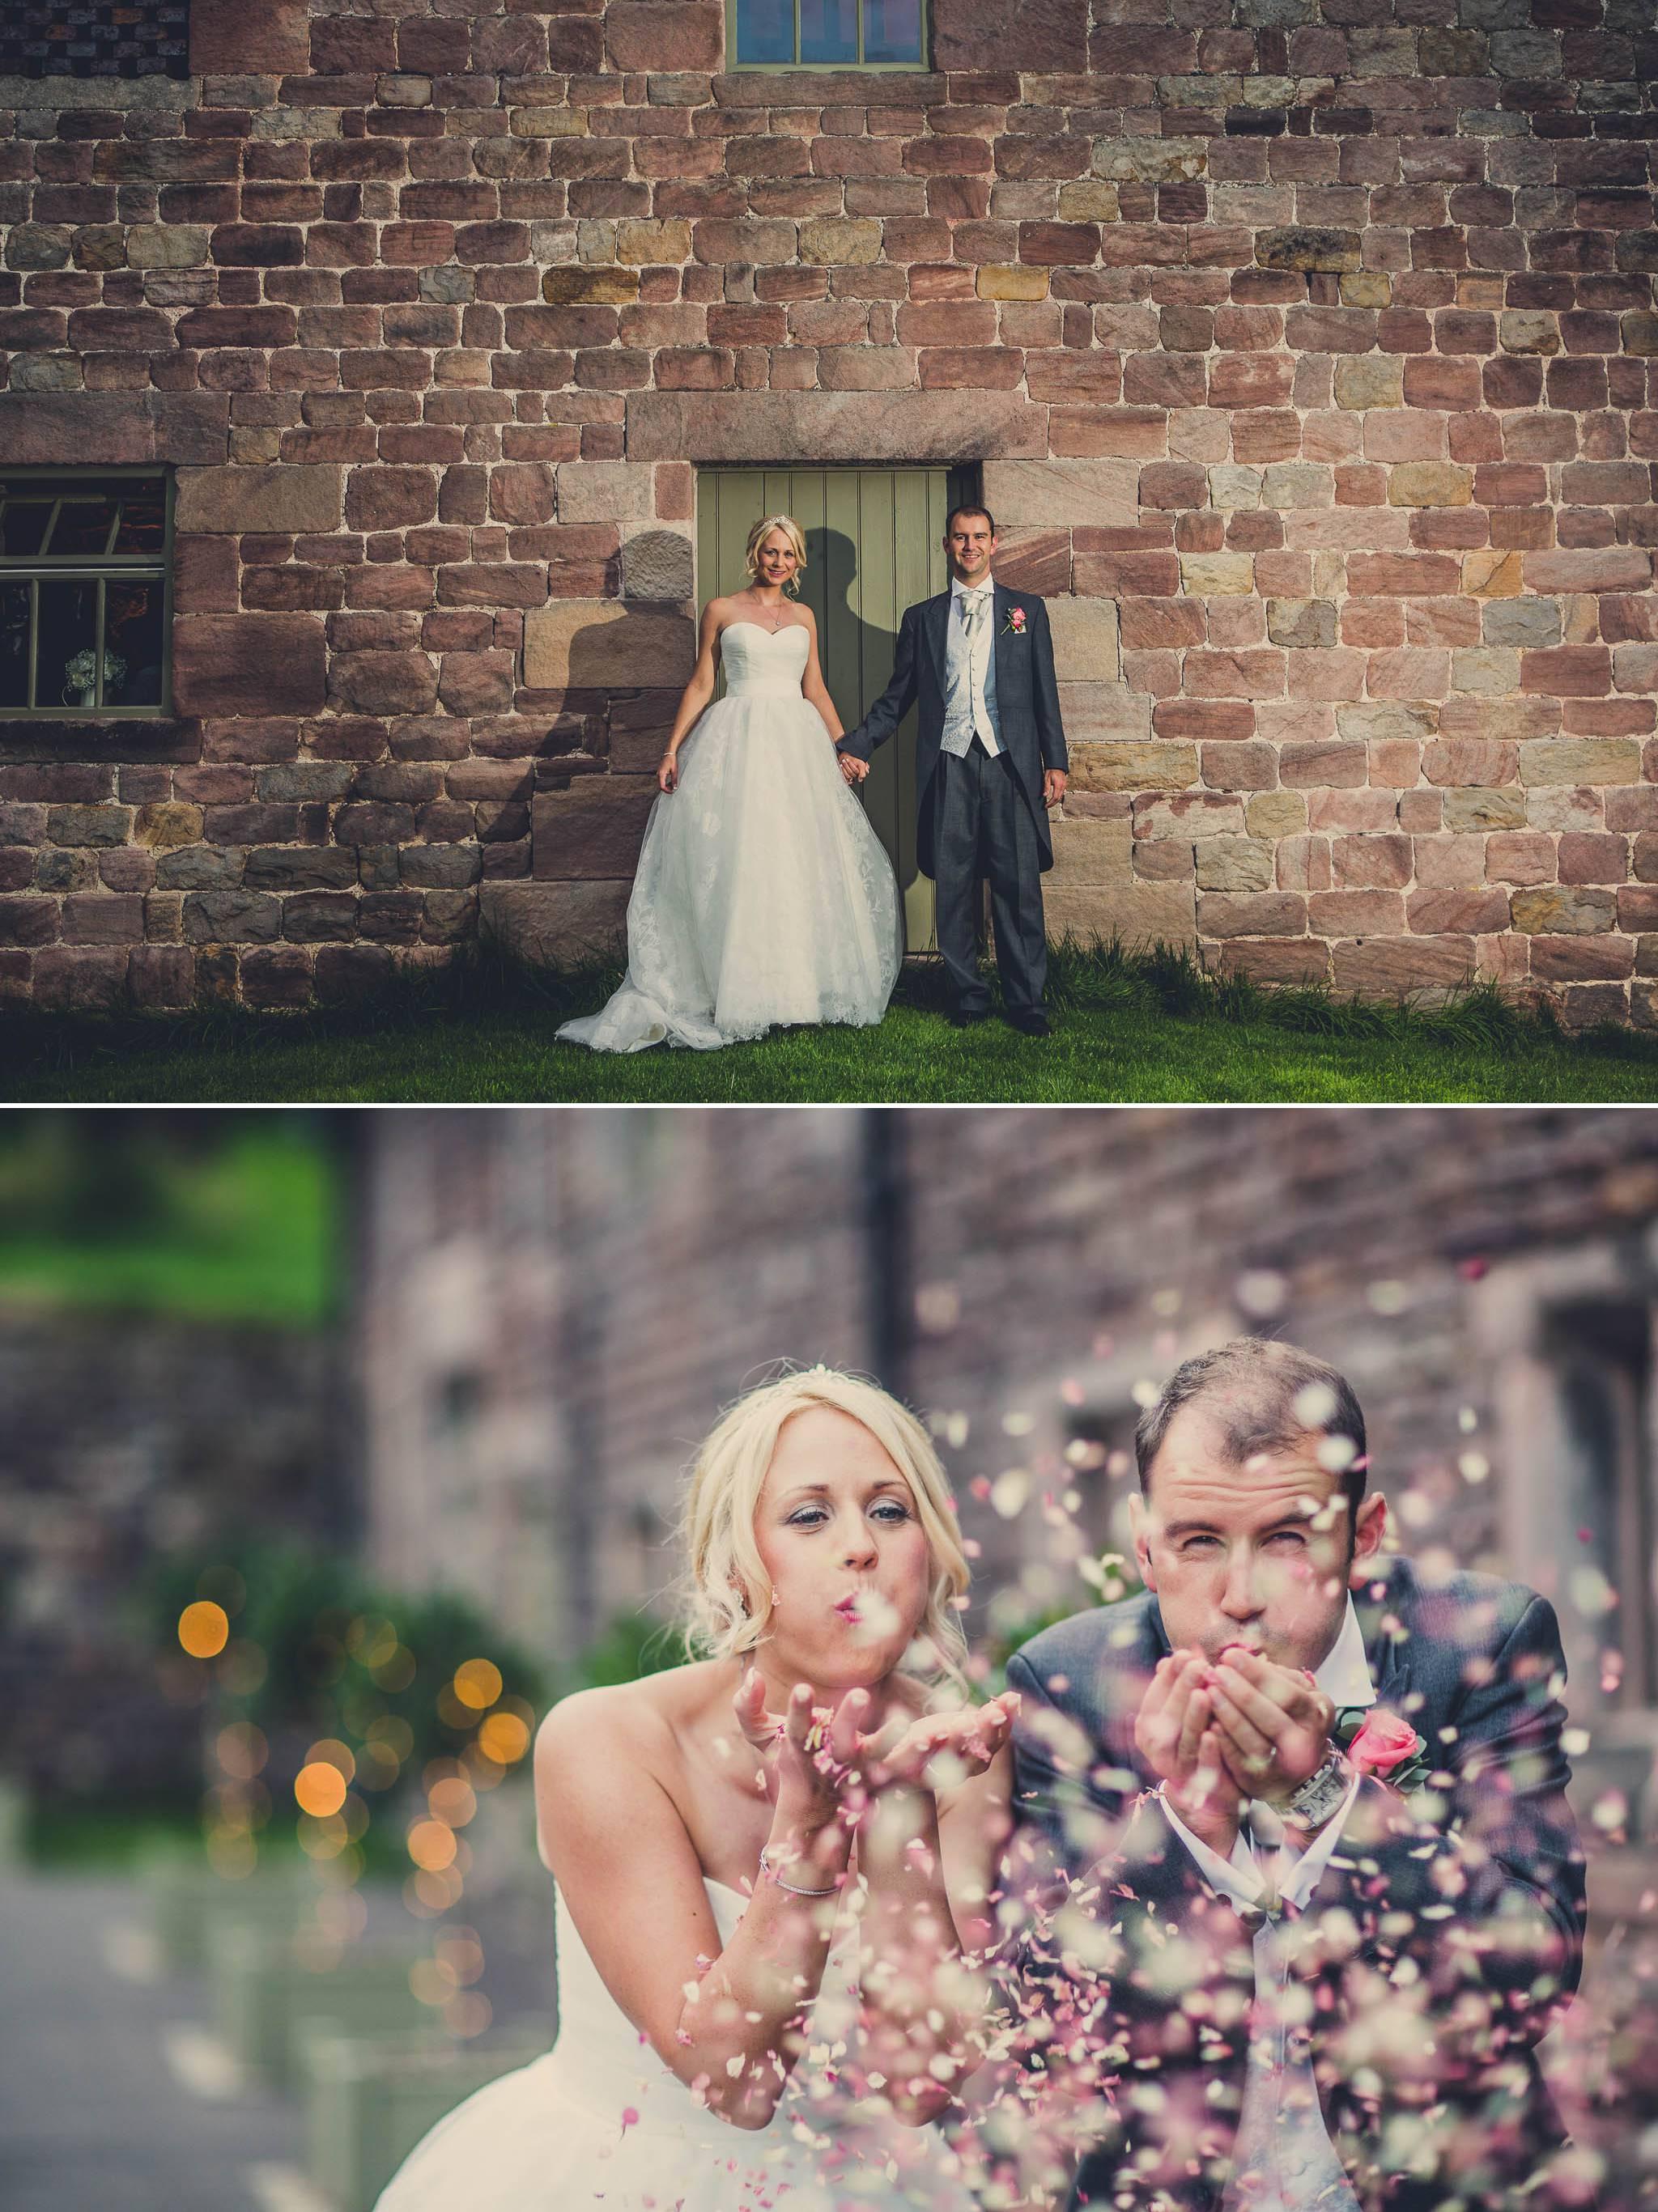 the-ashes-wedding-photographer 14.jpg